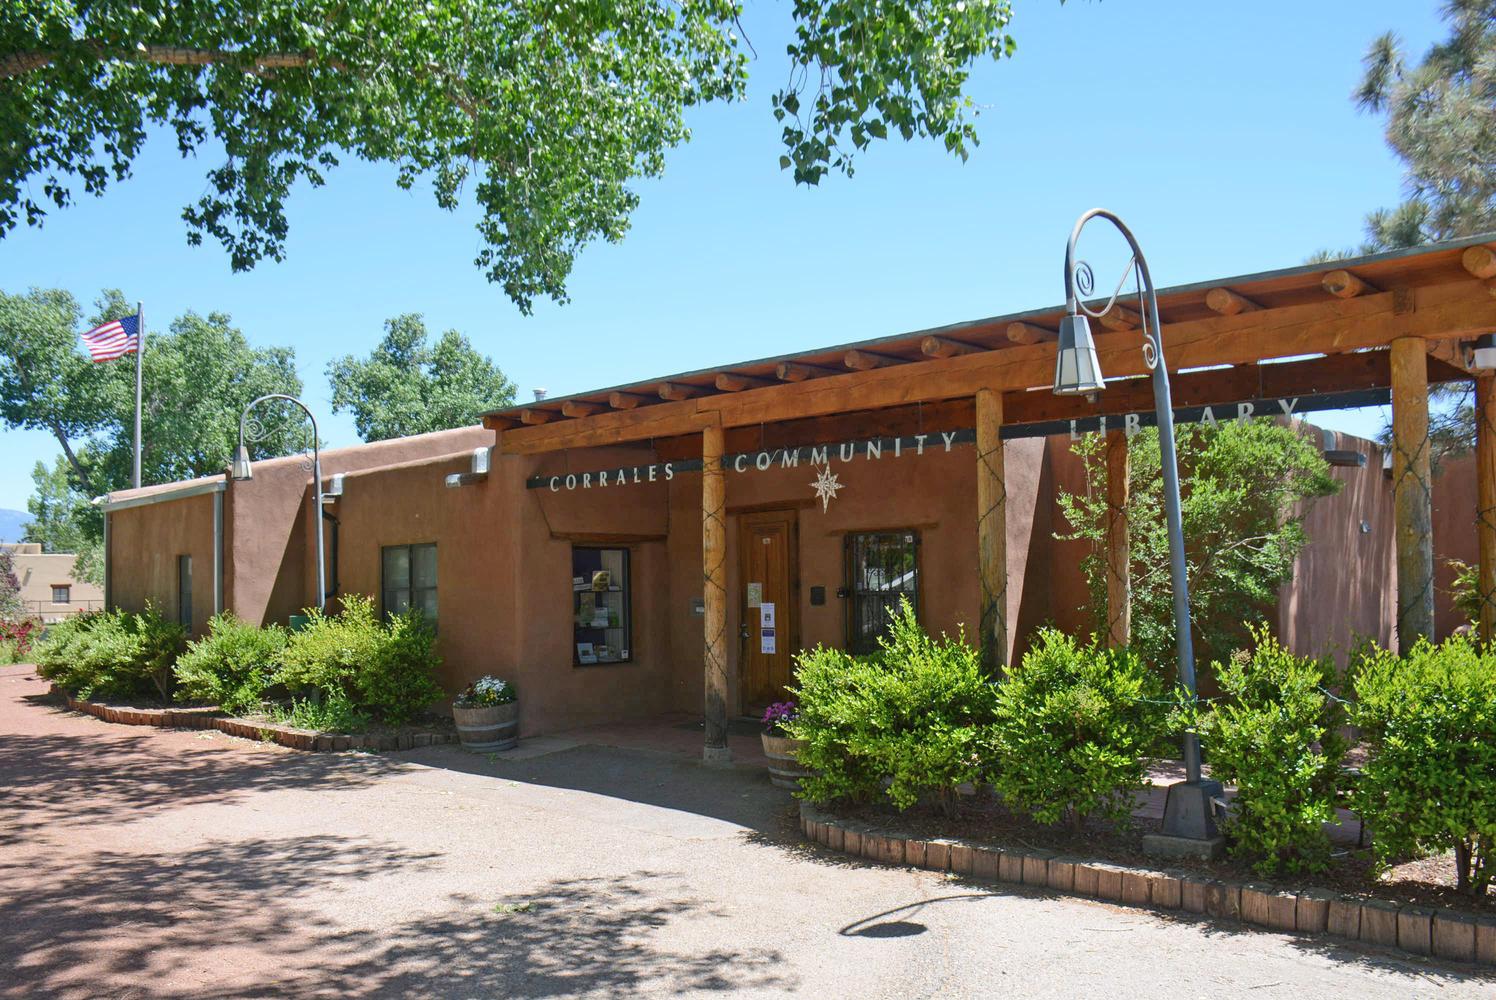 Corrales Community Library